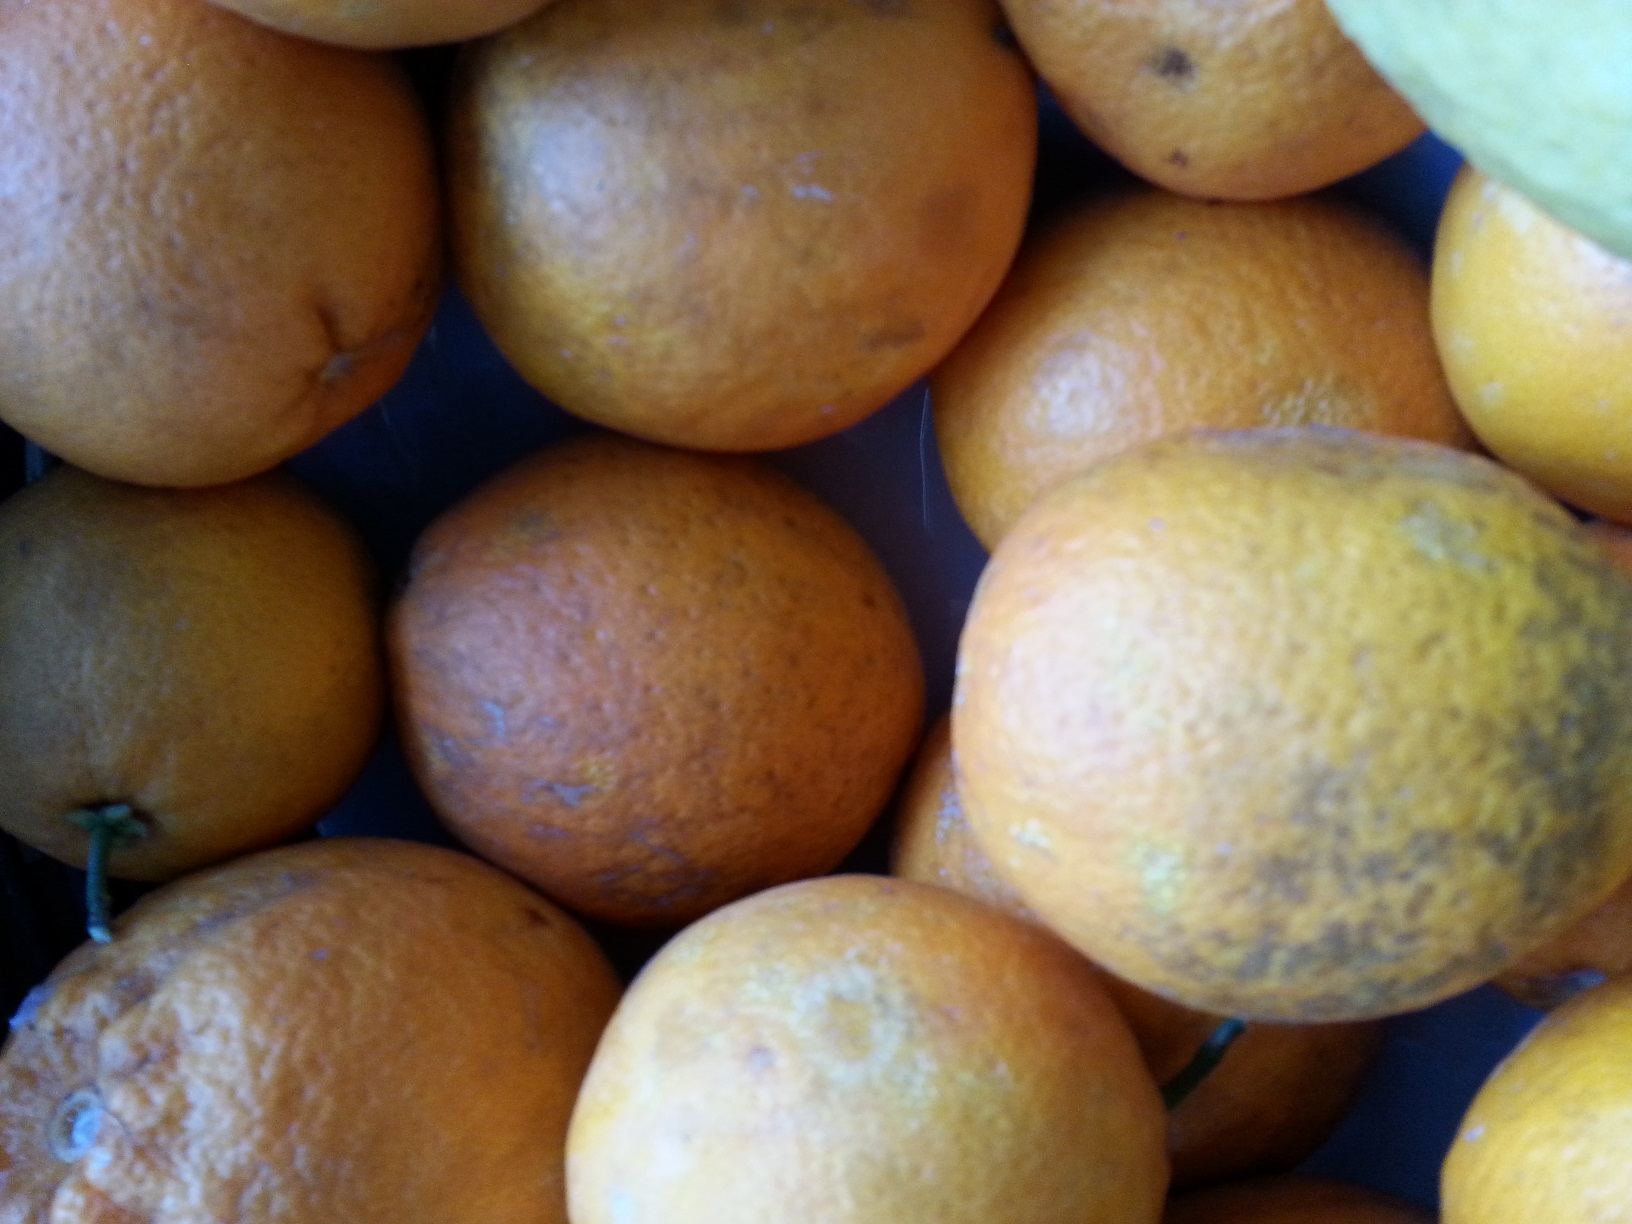 vegetales feos - naranjas